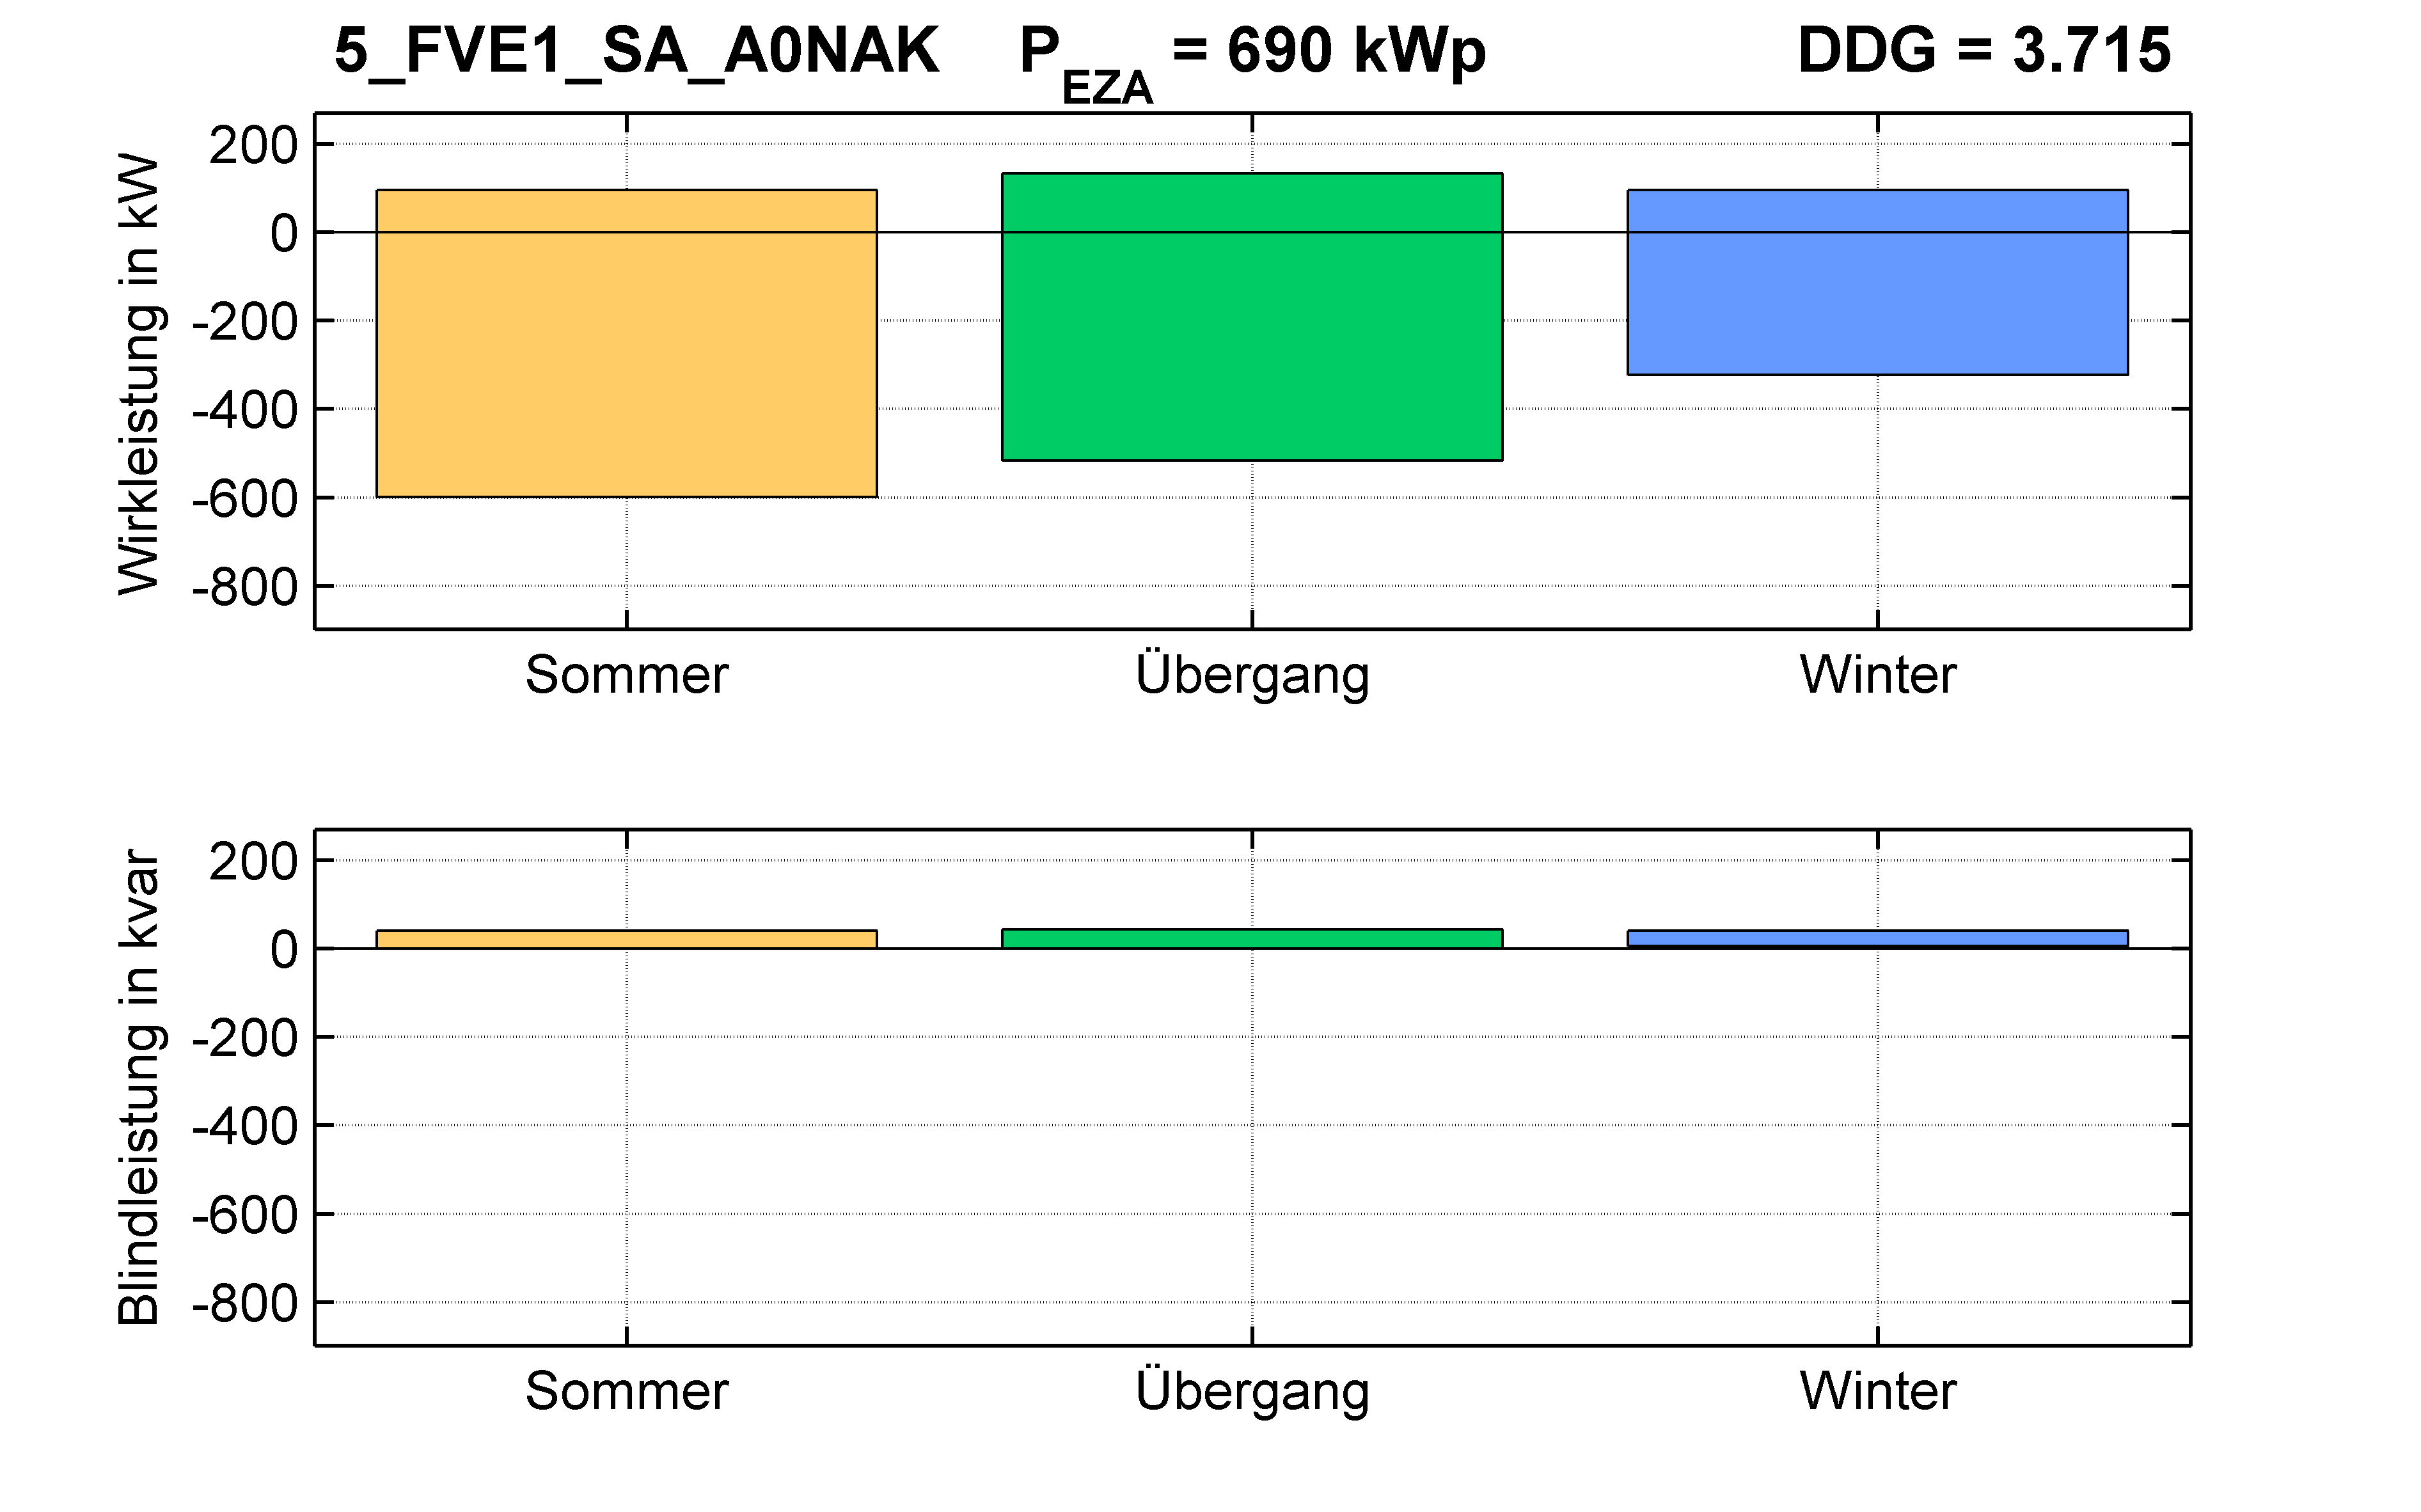 FVE1 | STATION (SA) A0NAK | PQ-Bilanz